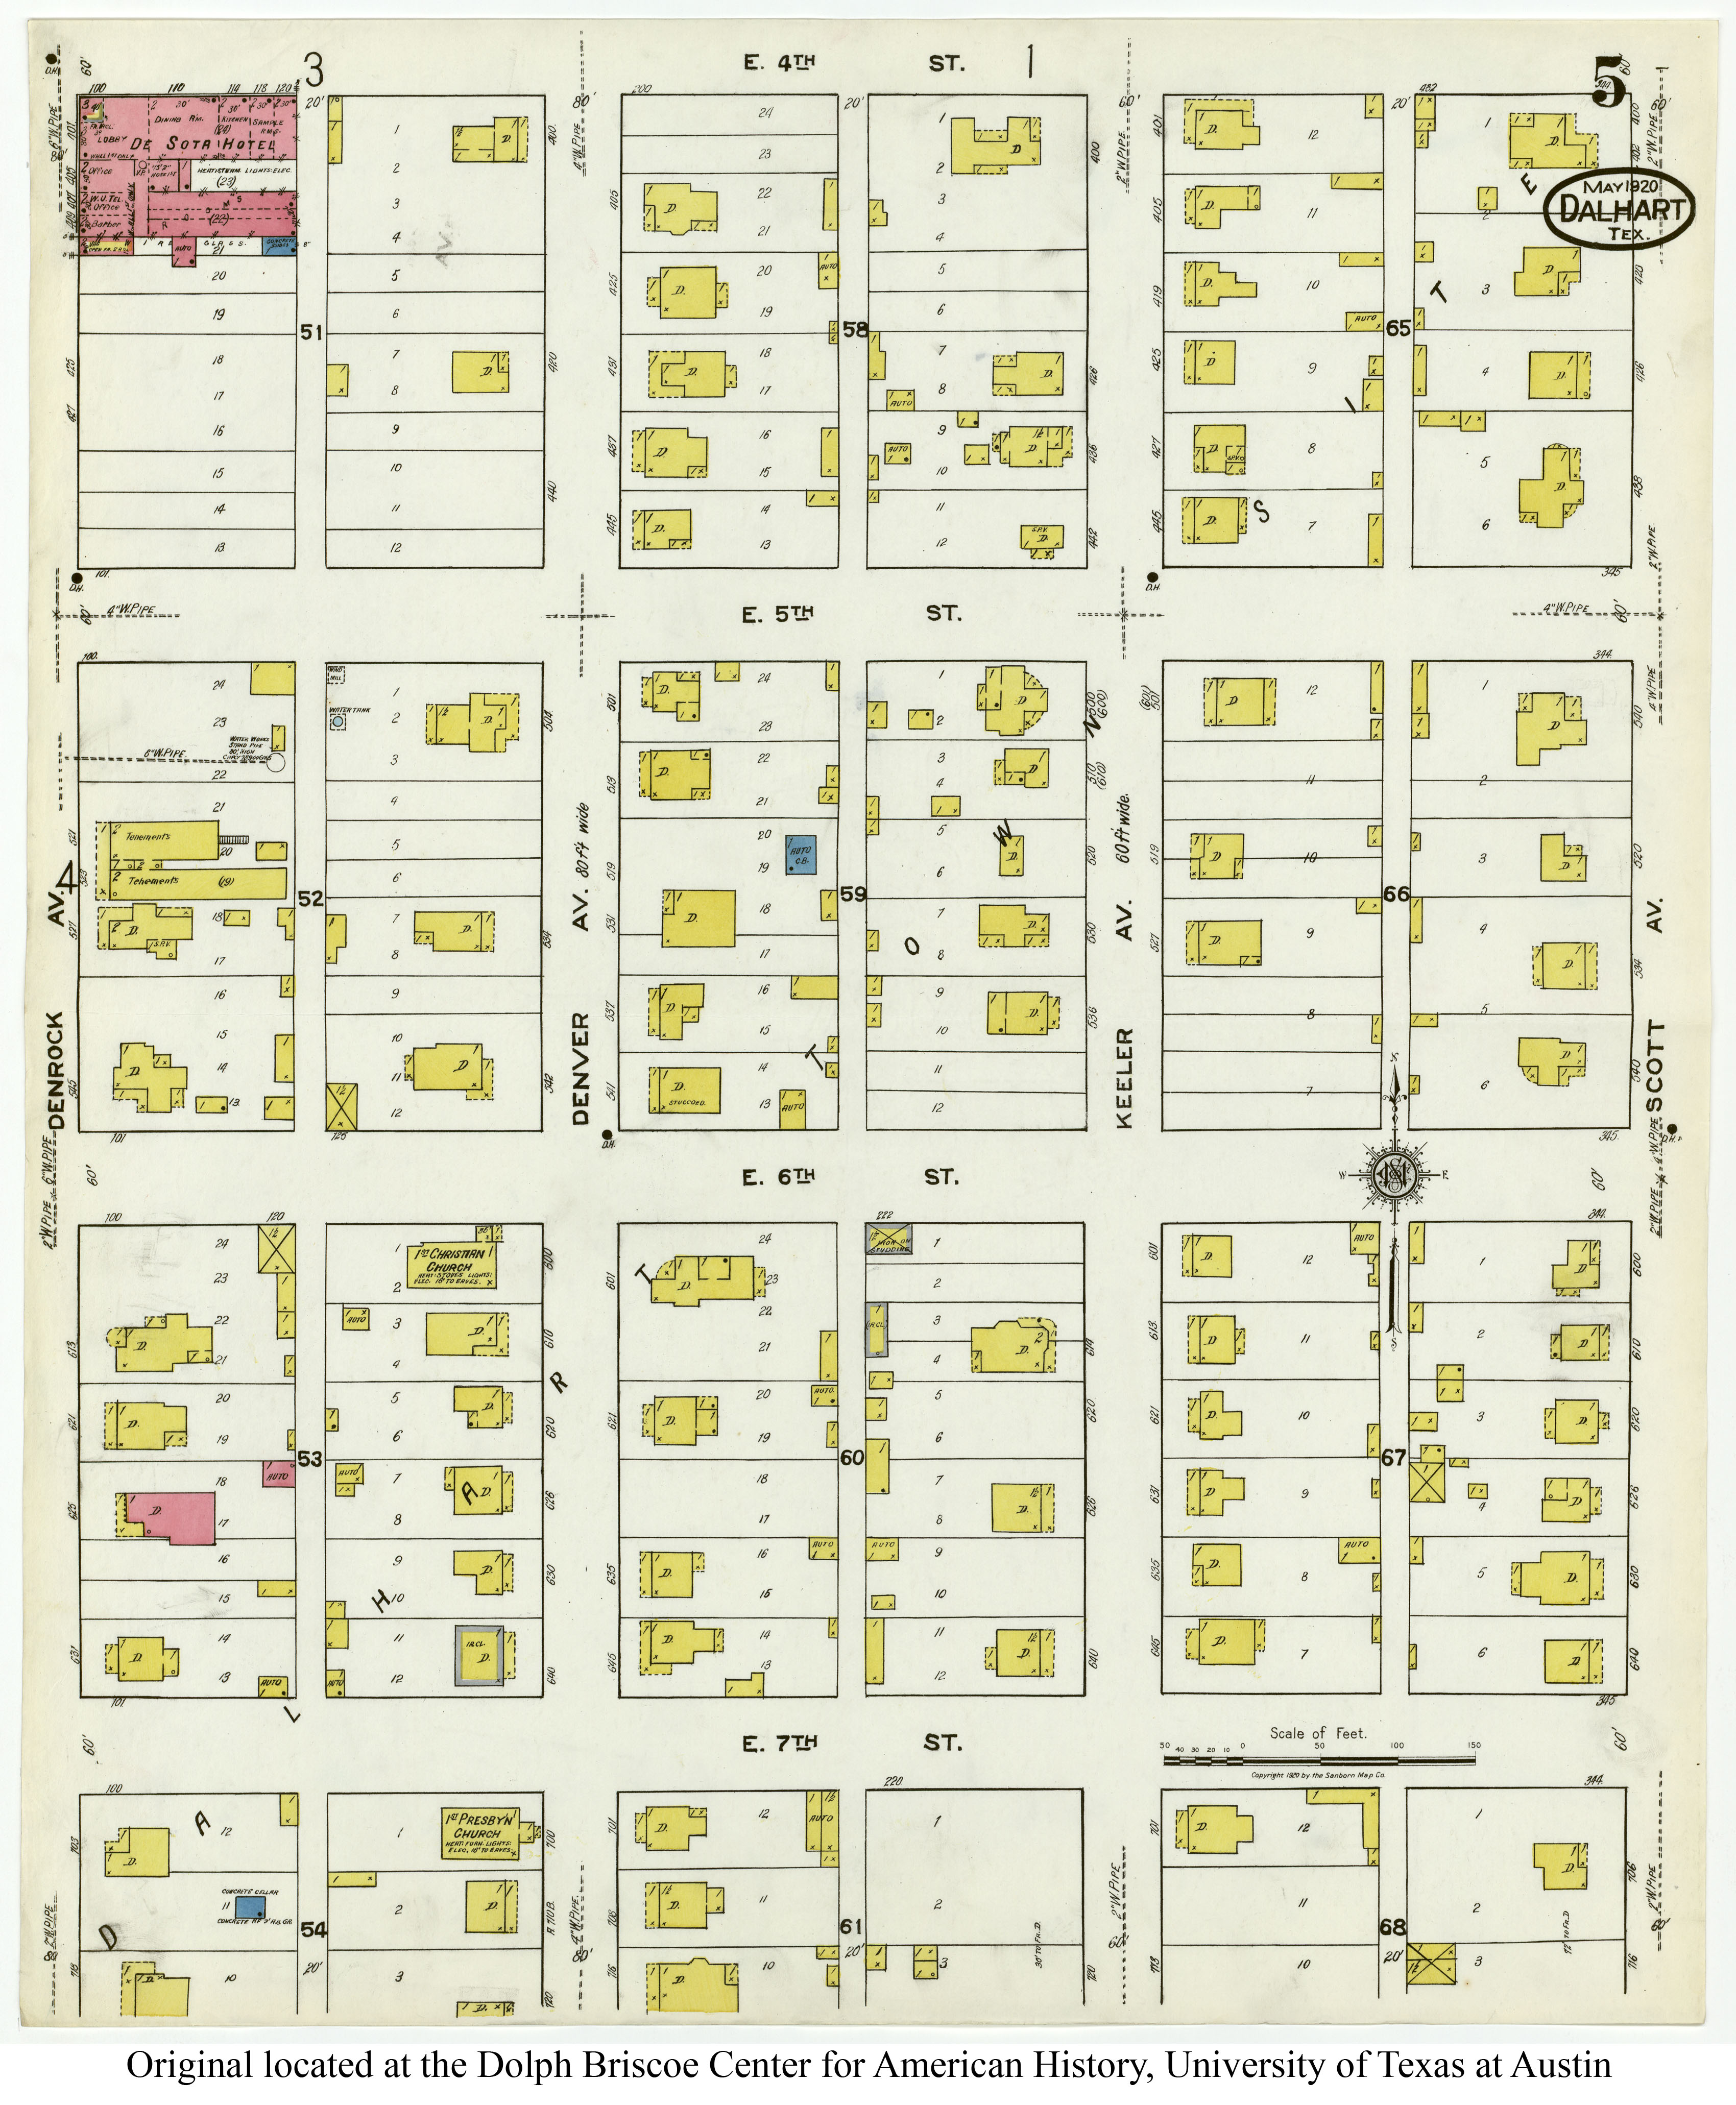 Dalhart Texas Map on